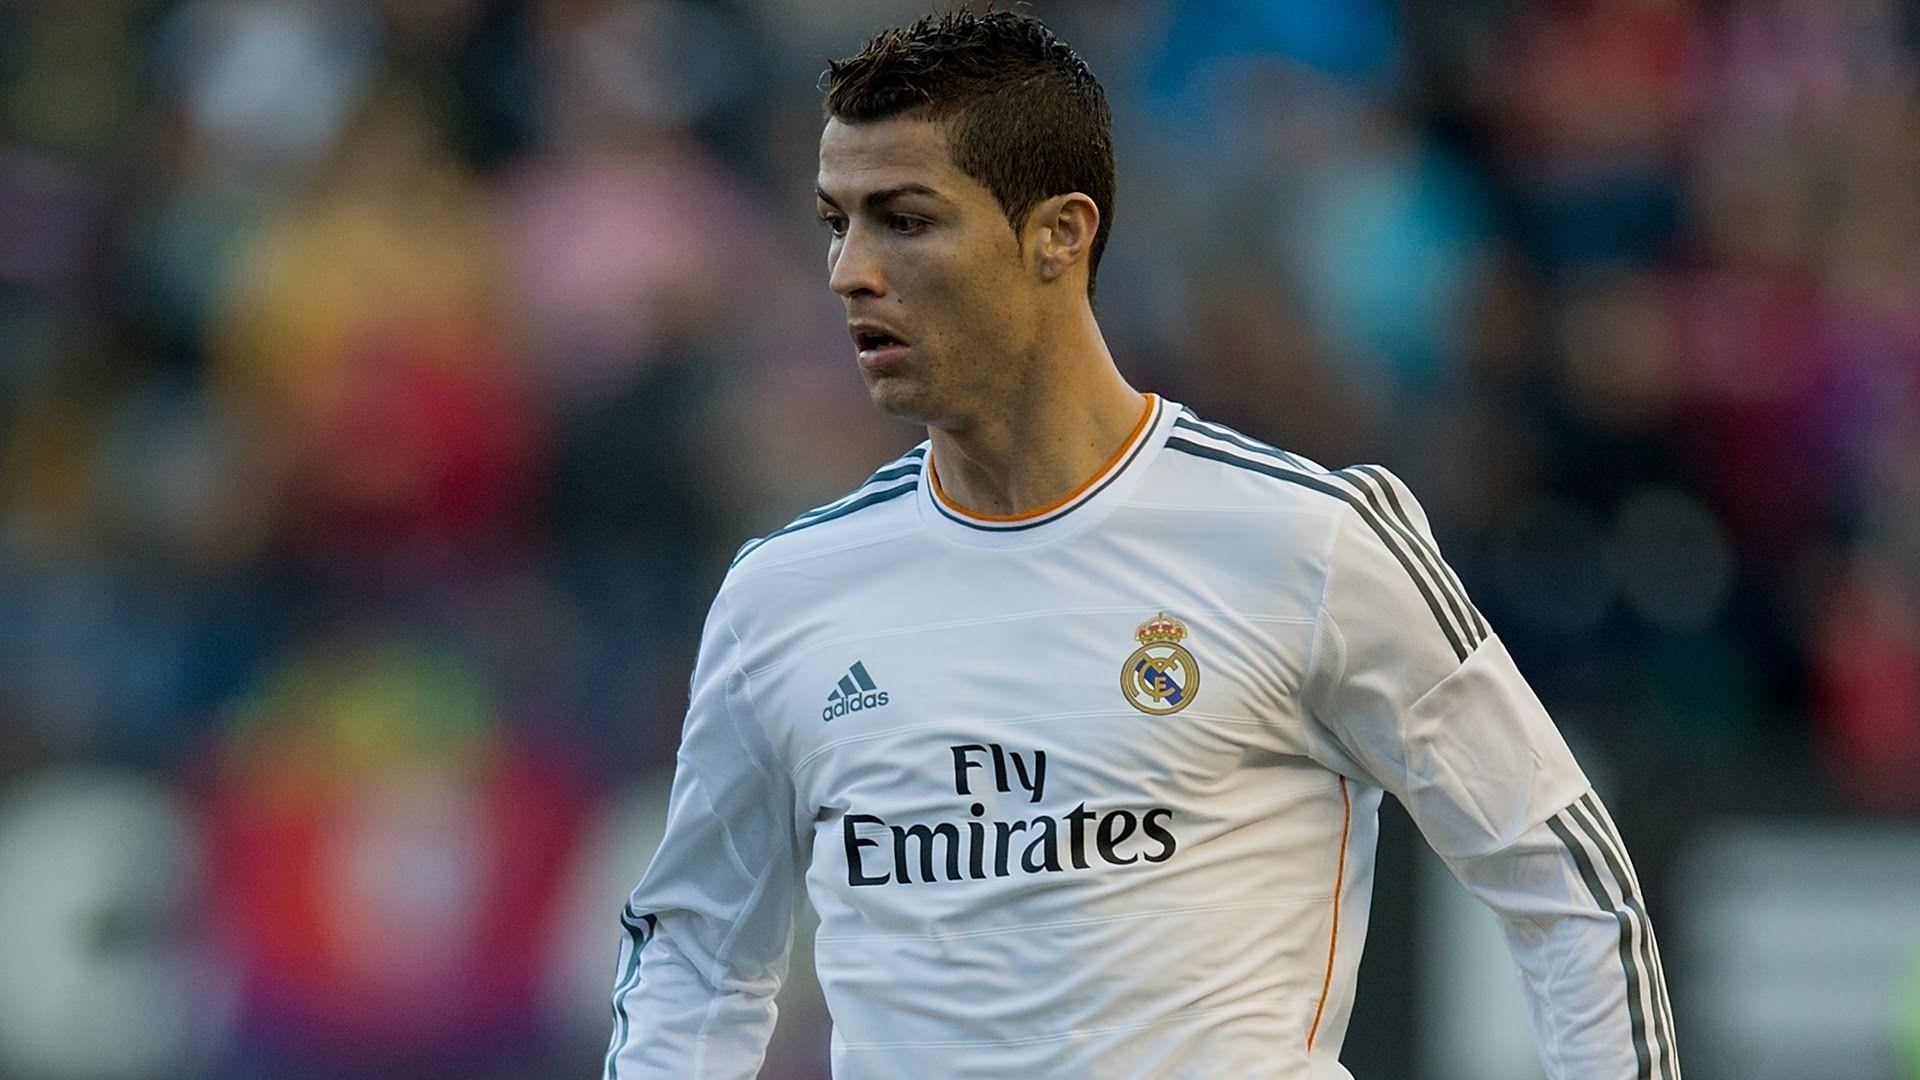 Cristiano Ronaldo's Extravagant Wedding Gift!